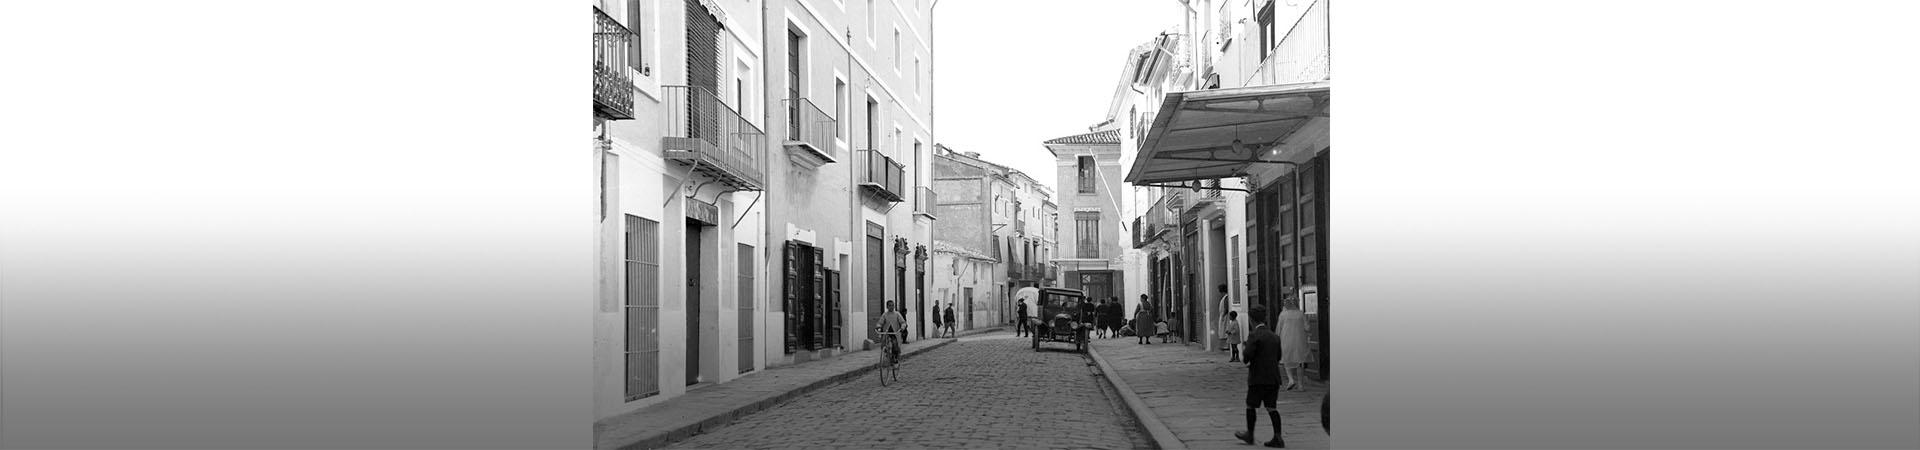 Una calle de Cullera (Valencia) 1905-1929. Fondo Thomas / Agfitel